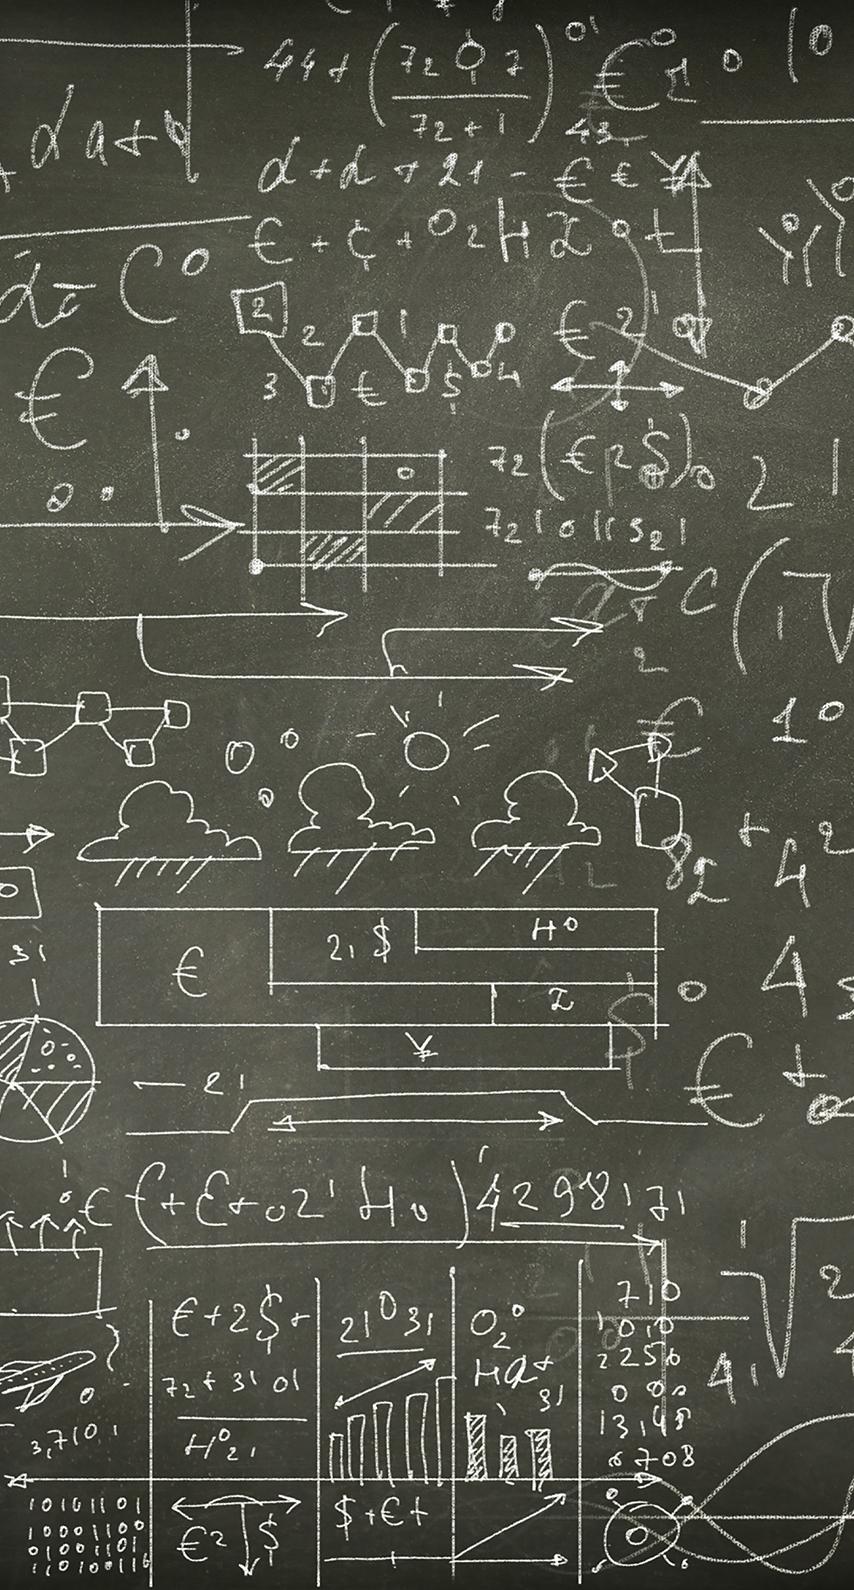 chalkboard, calculus, minus, formula, lesson, physics, study, addition, subtraction, complex